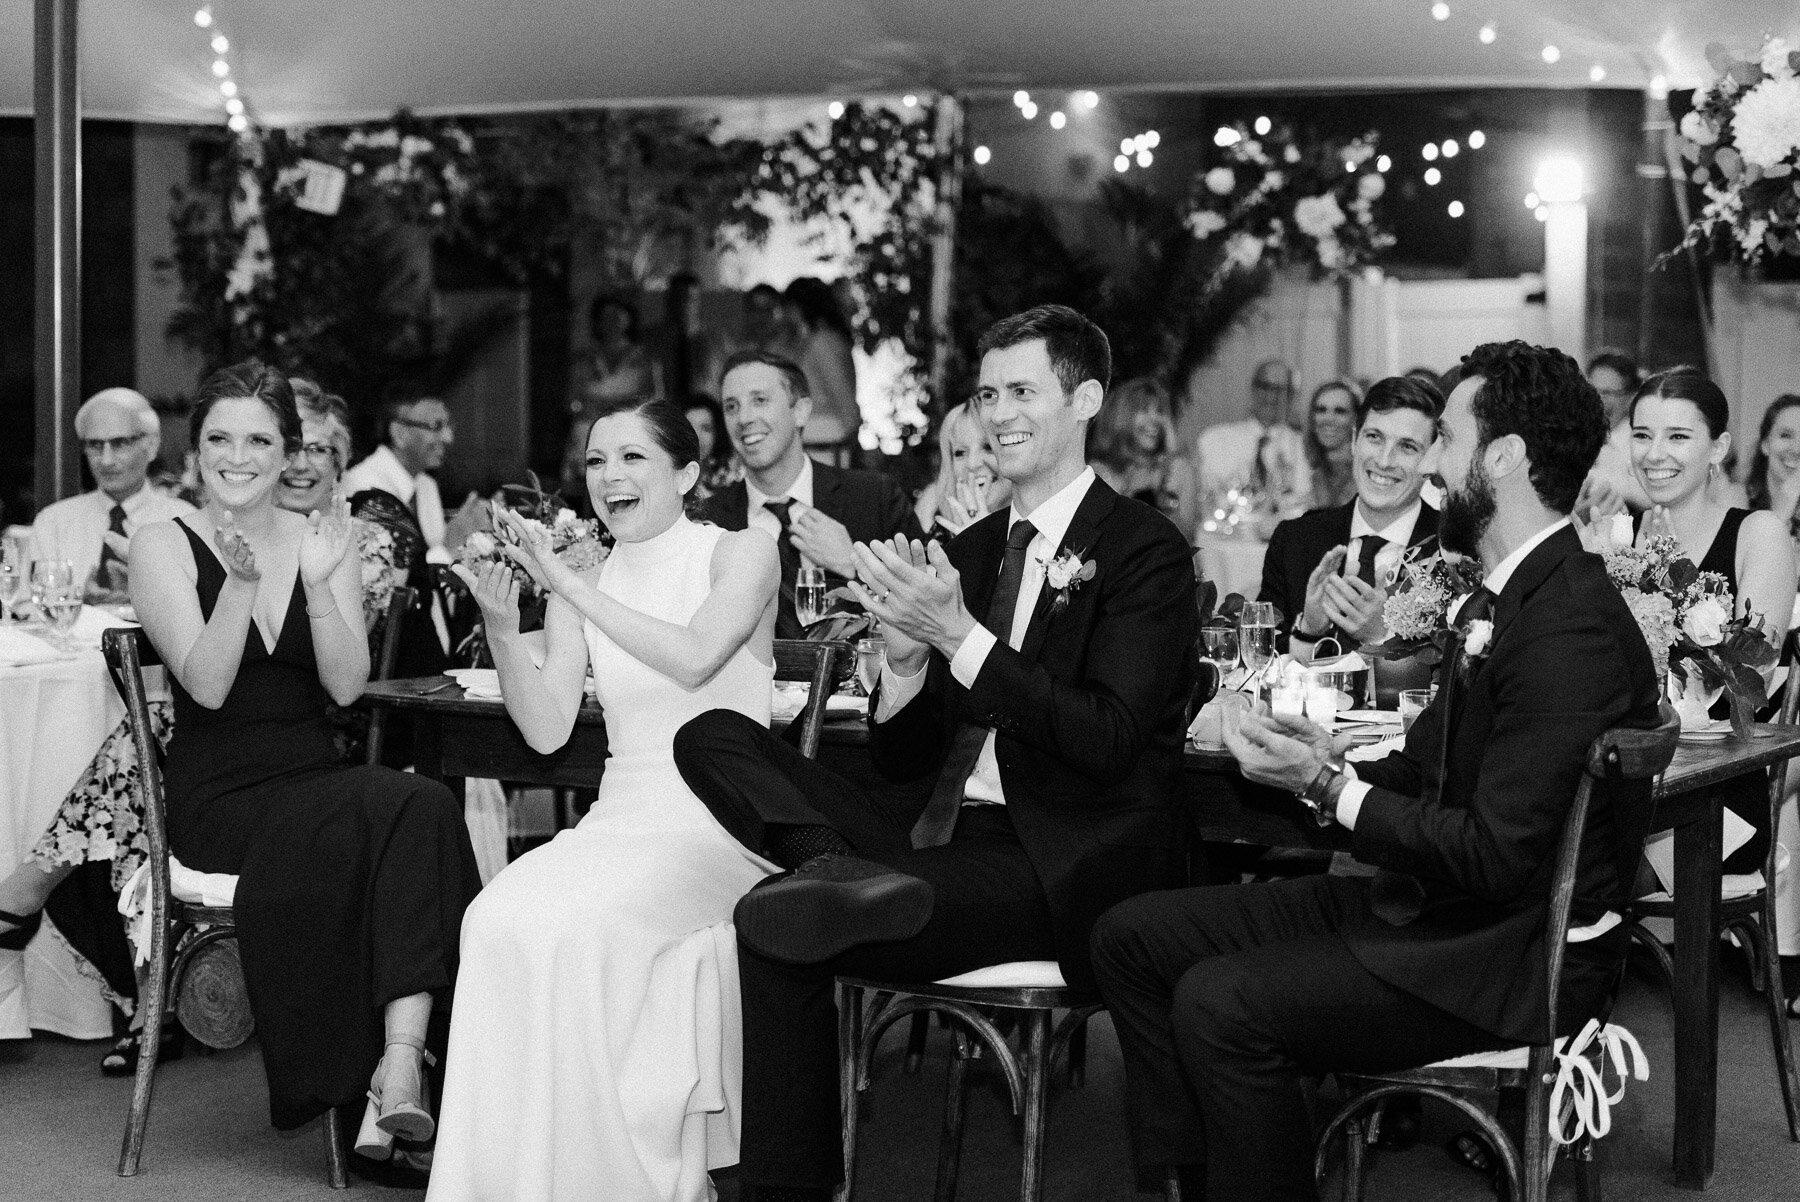 Adelphi Saratoga Wedding by Michelle Lange Photography-59.jpg